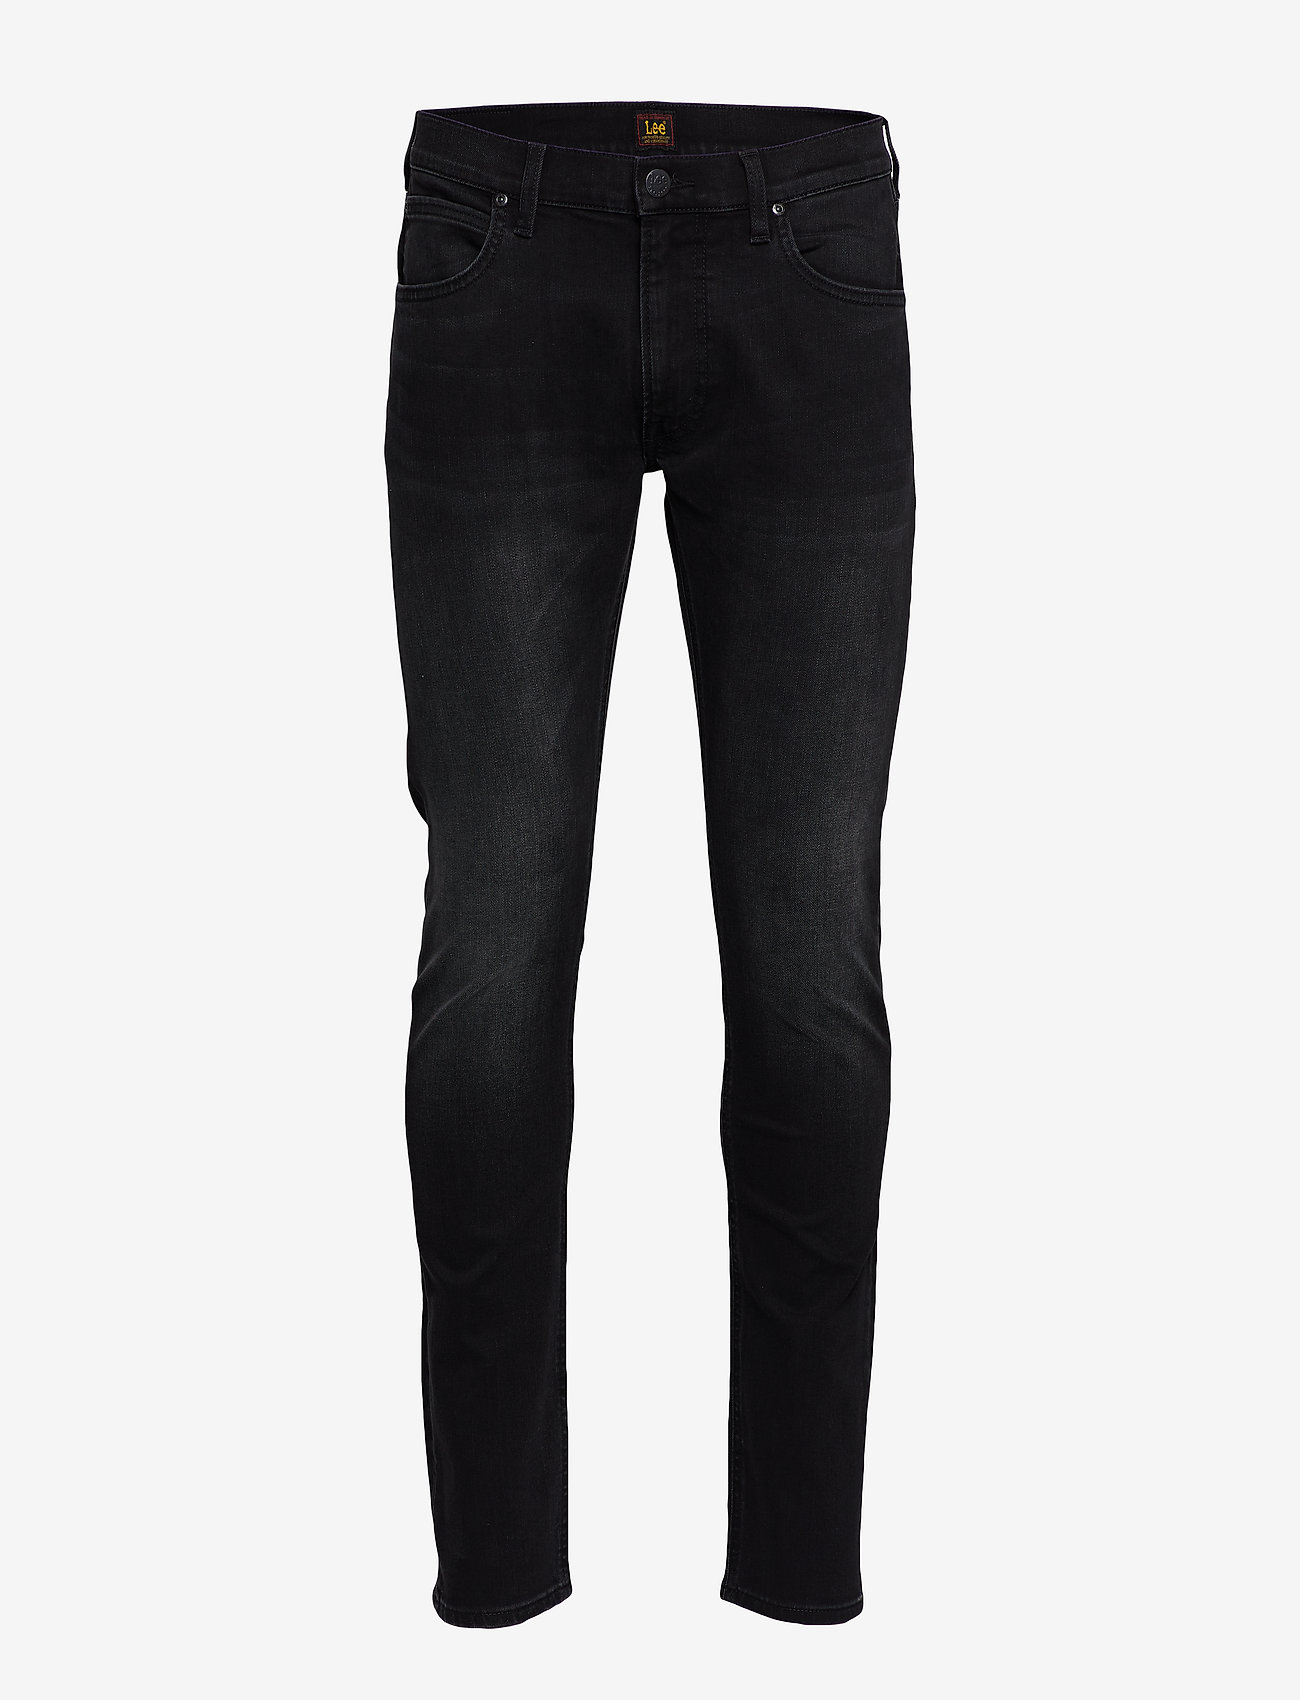 Lee Jeans - Luke - tapered jeans - moto black - 0